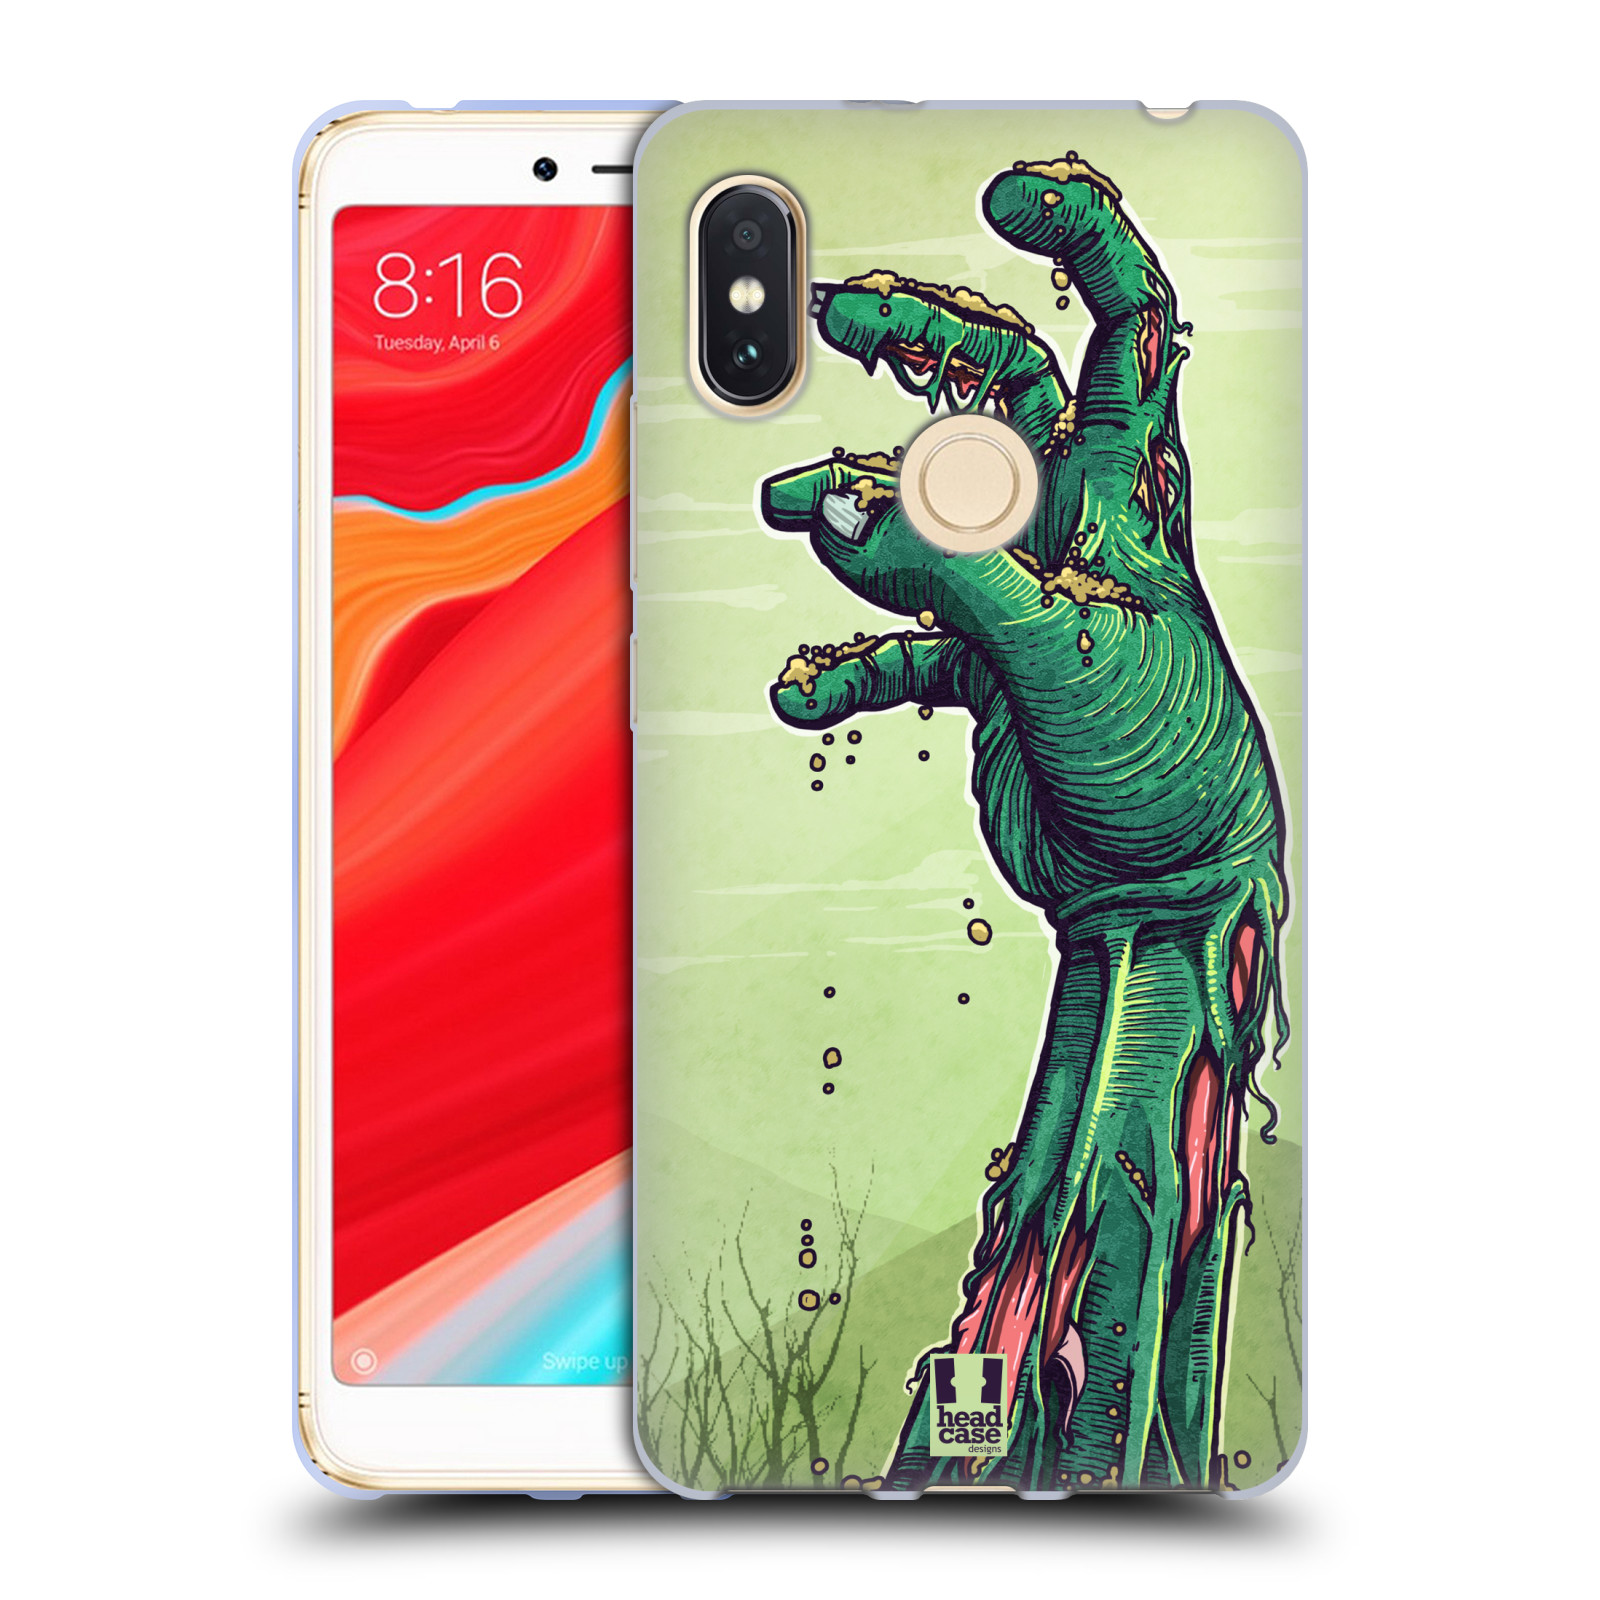 Silikonové pouzdro na mobil Xiaomi Redmi S2 - Head Case - ZOMBIE RUKA